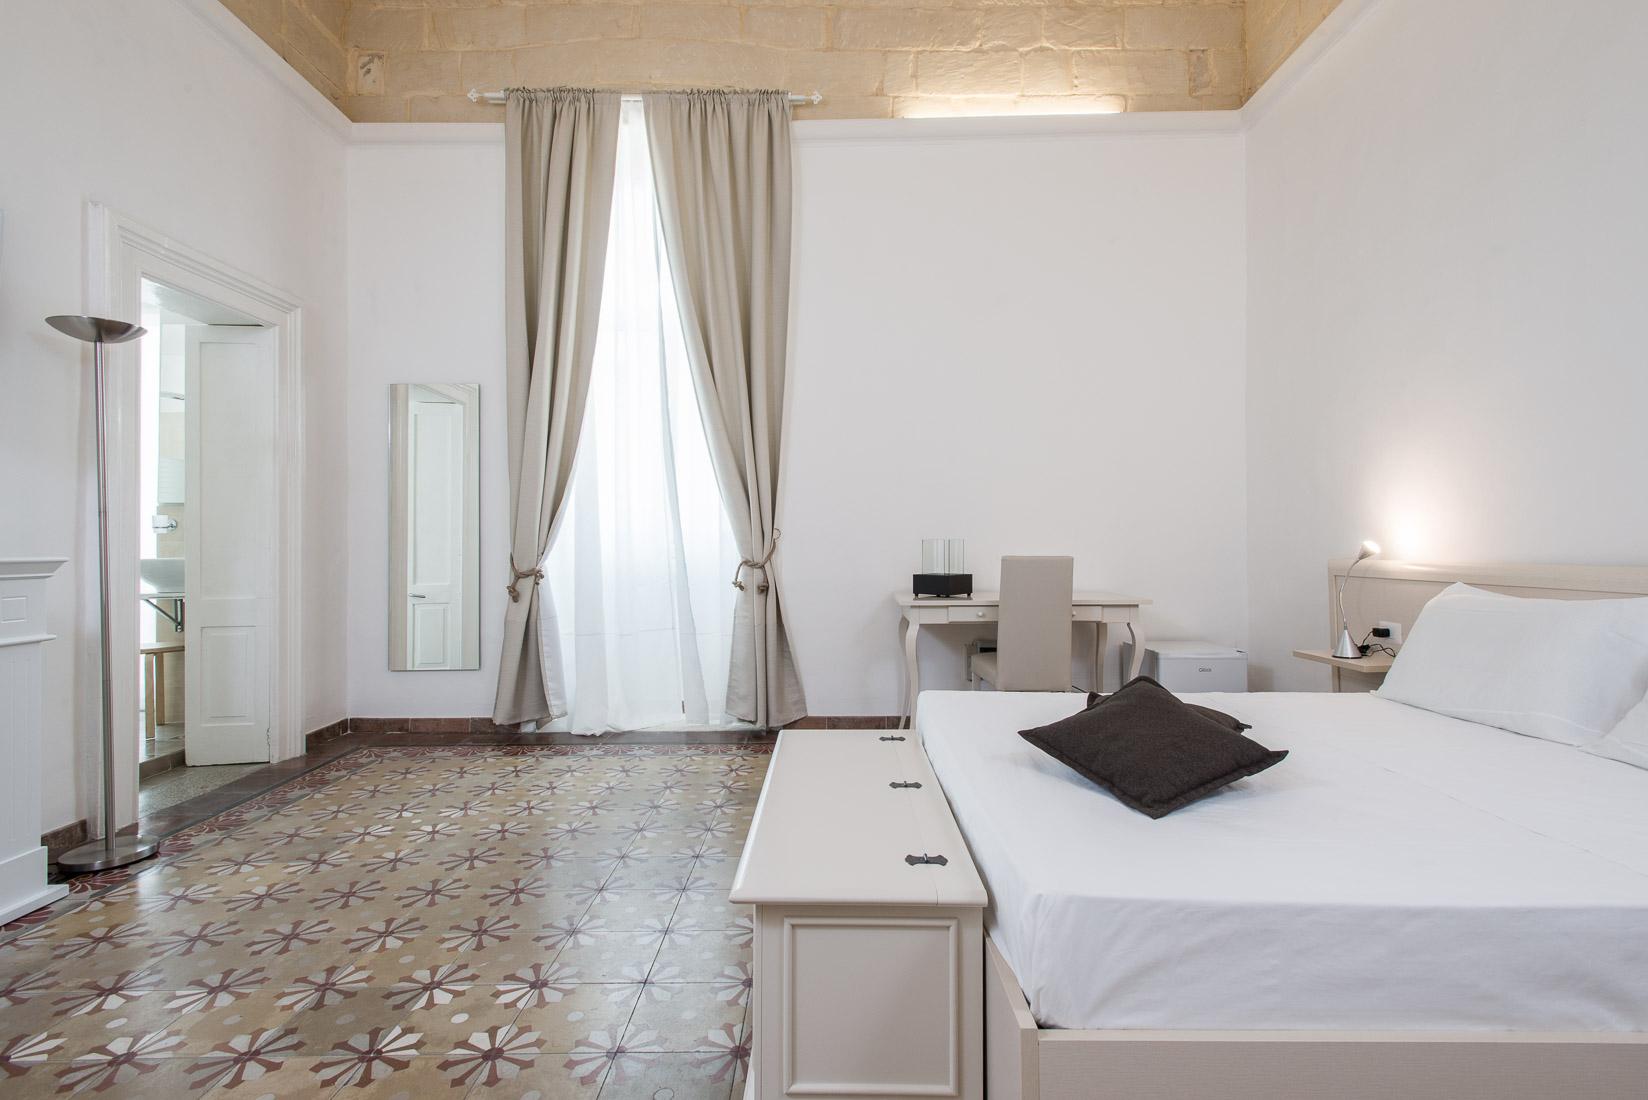 https://www.orlandinifrancesco.com/wp/wp-content/uploads/2019/01/Ada-Suite-Lecce-10.jpg